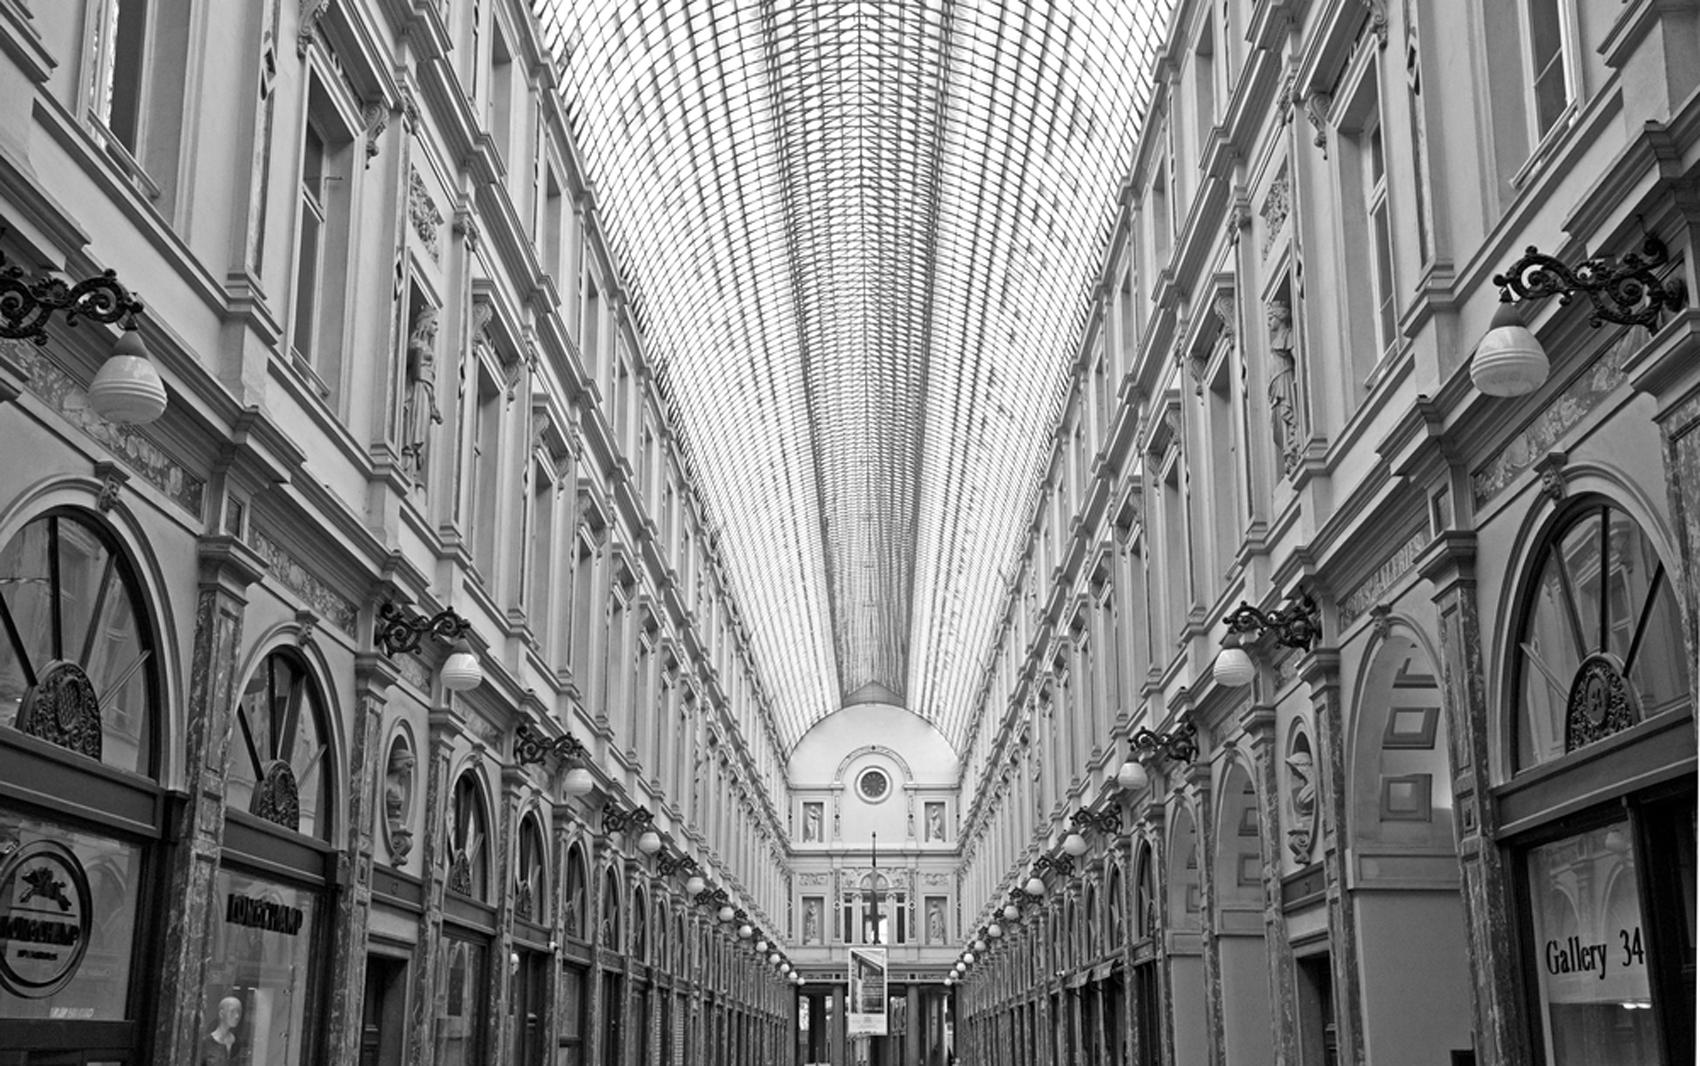 galleries-2